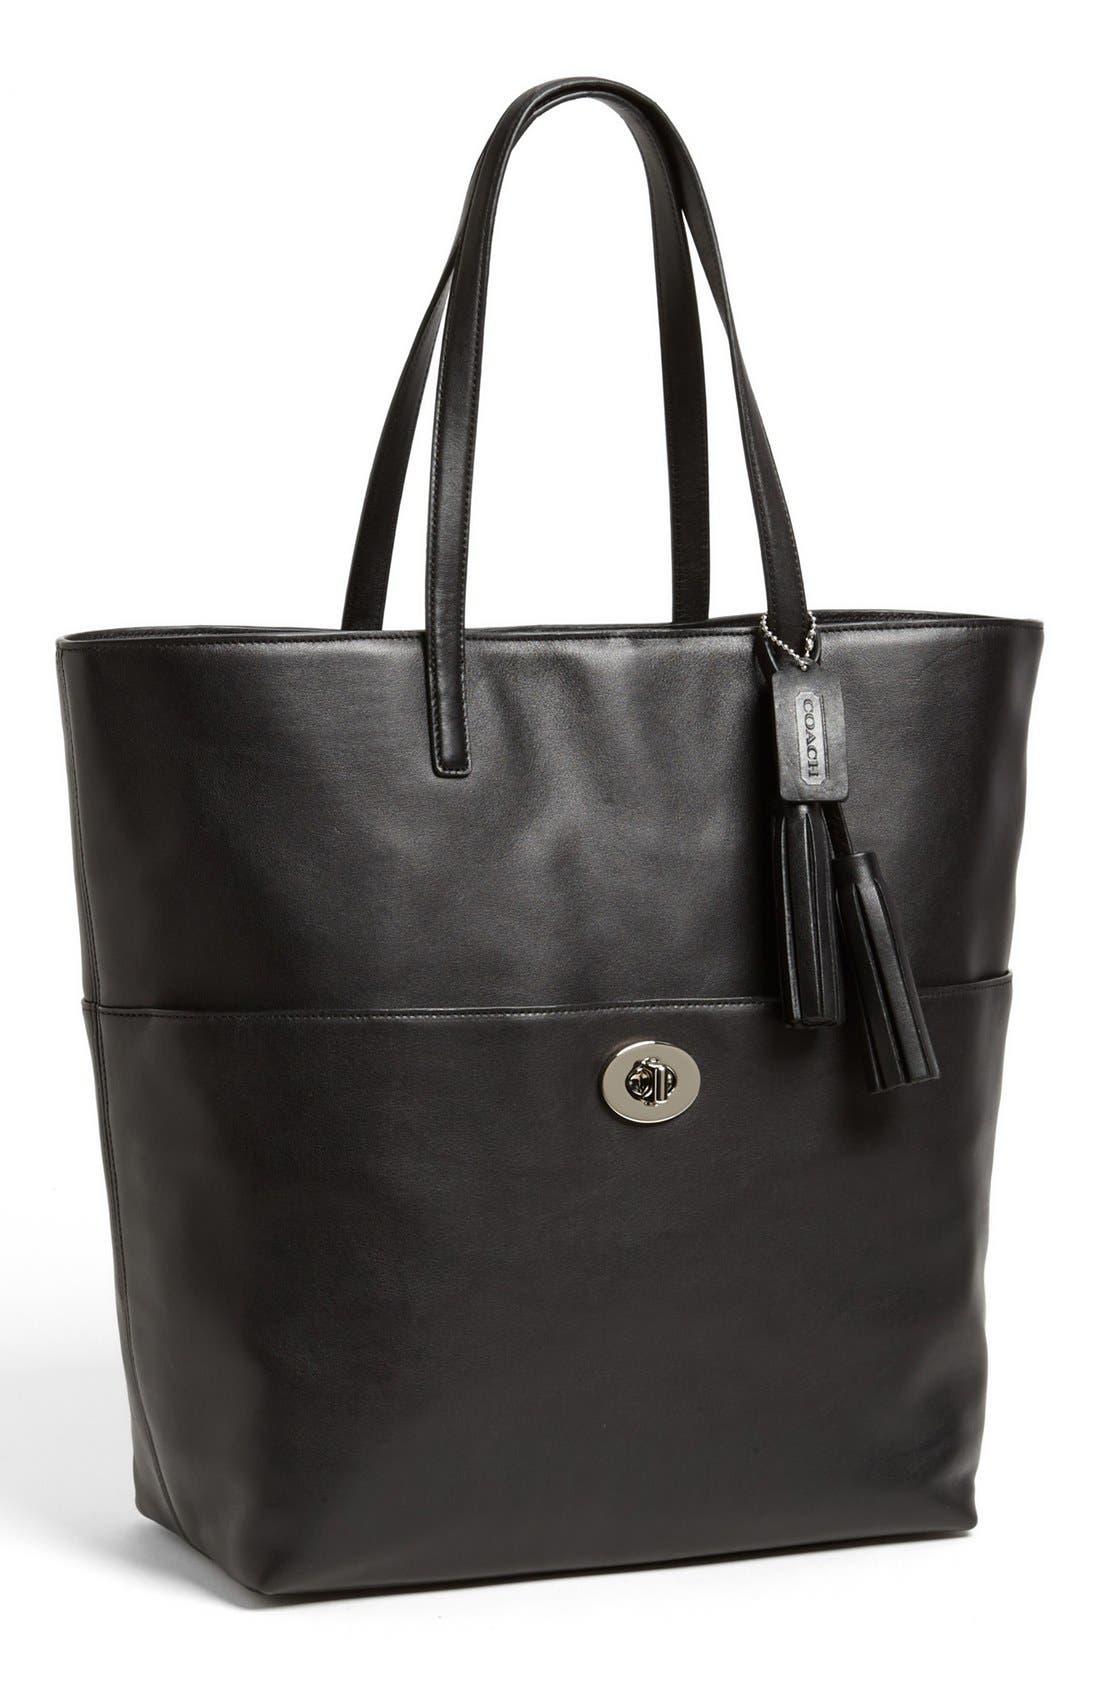 Main Image - COACH 'Legacy' Leather Tote